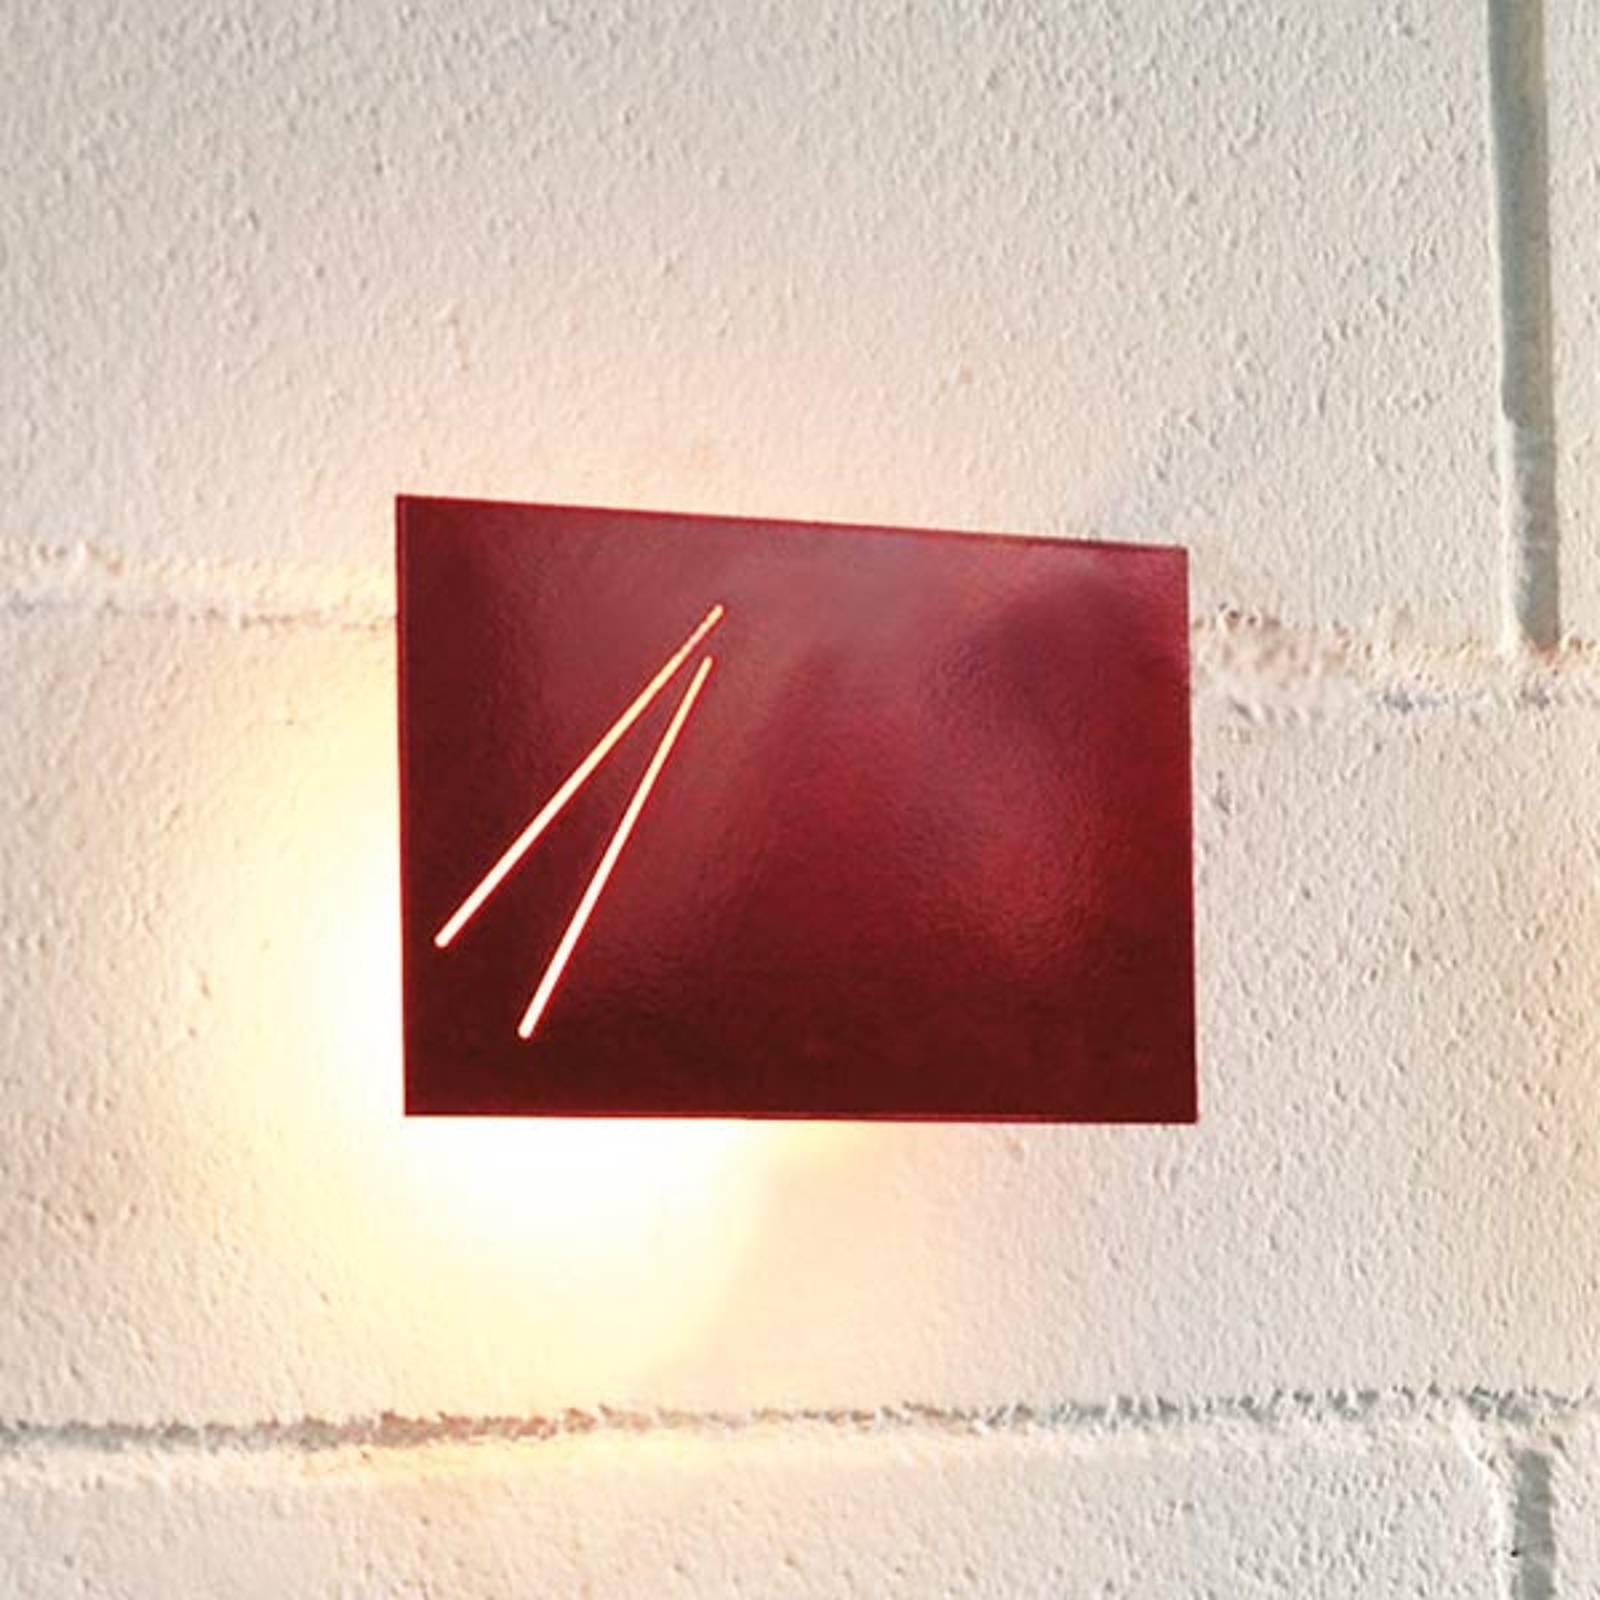 Des.agn - Italiaanse designer wandlamp, rood